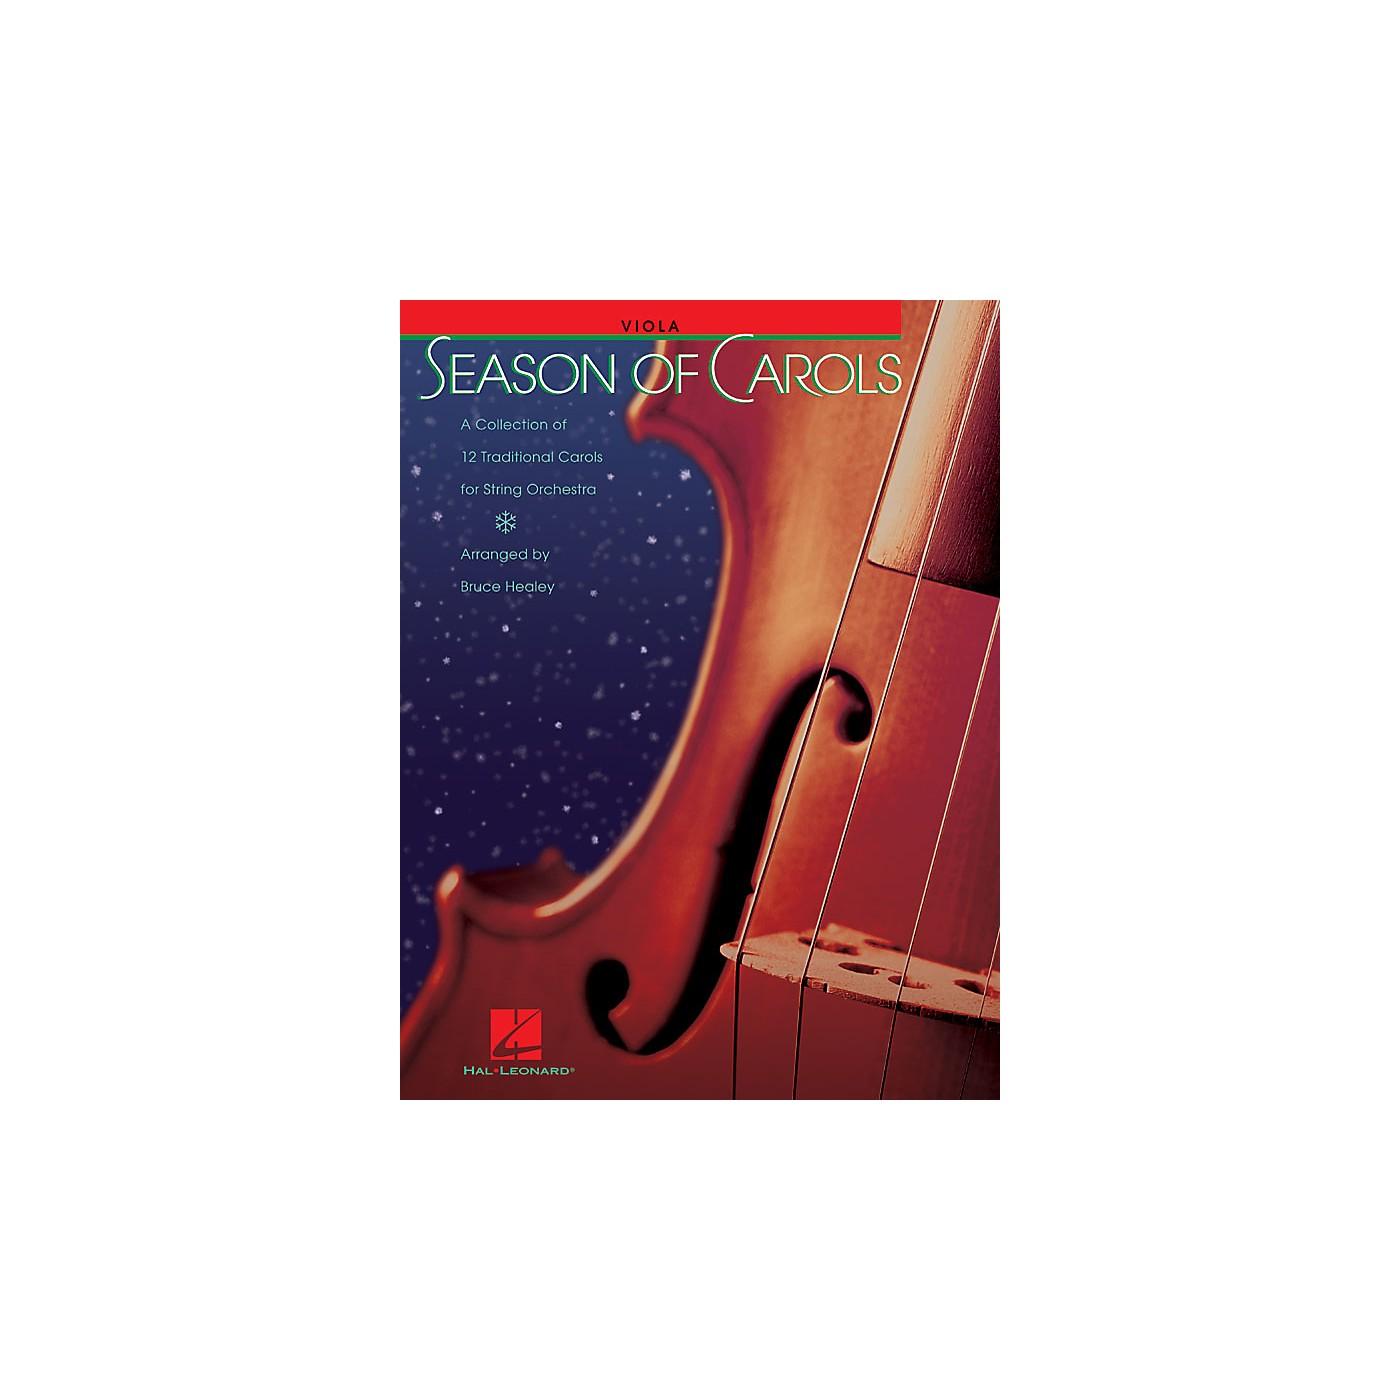 Hal Leonard Season of Carols (String Orchestra - Viola) Music for String Orchestra Series Arranged by Bruce Healey thumbnail